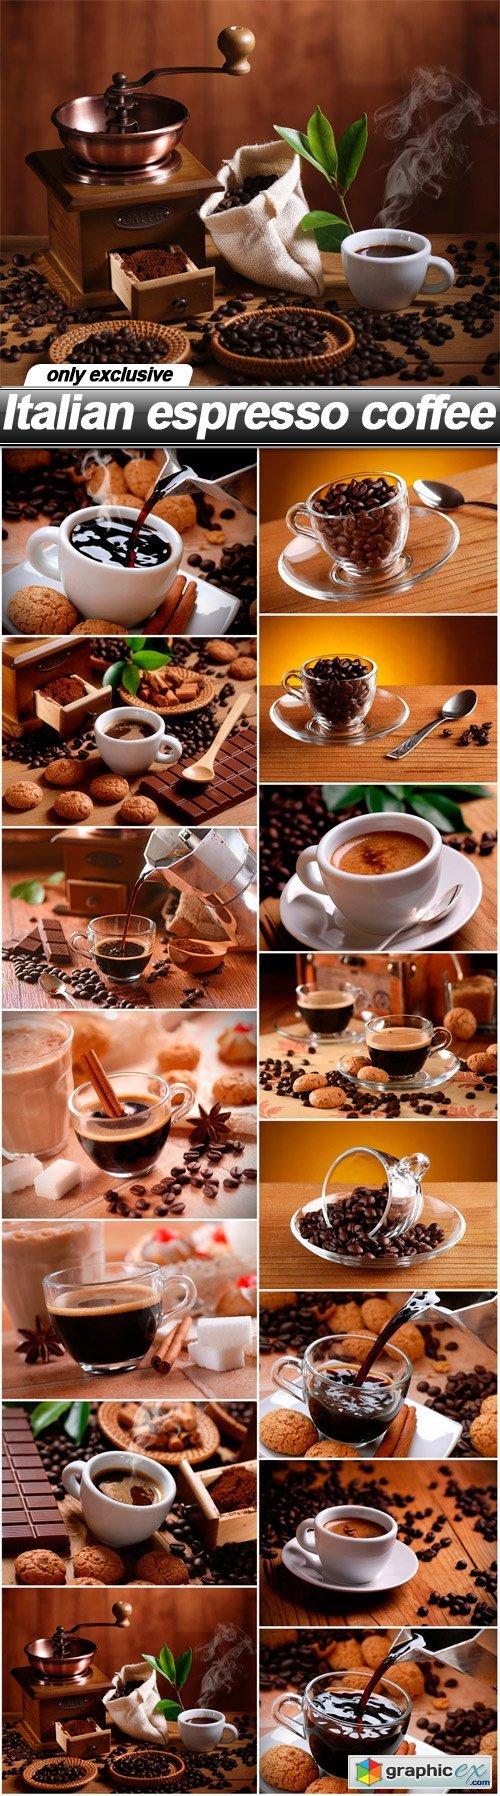 Italian espresso coffee - 15 UHQ JPEG